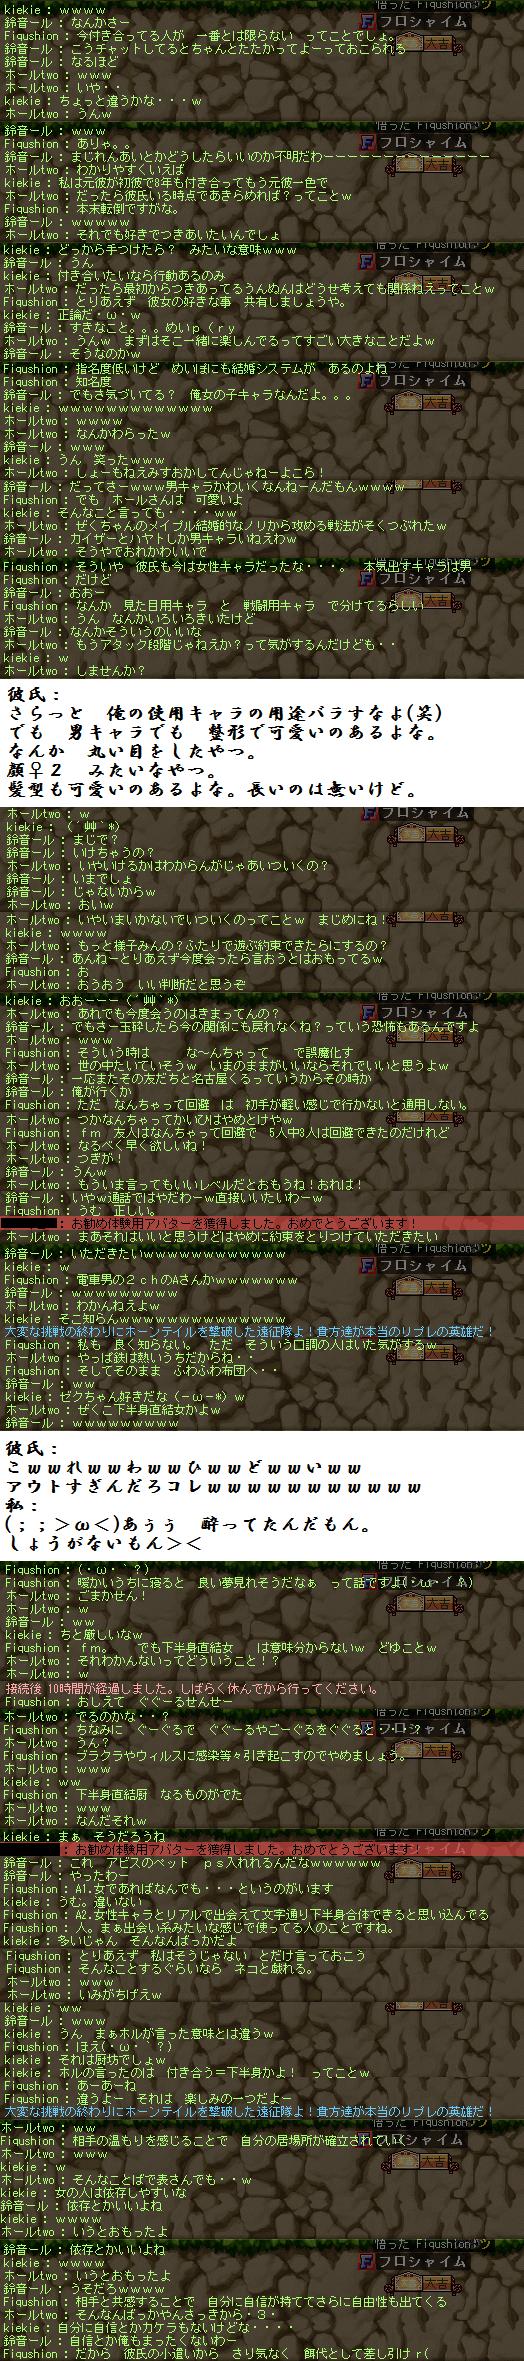 2013_0415_0035 _4